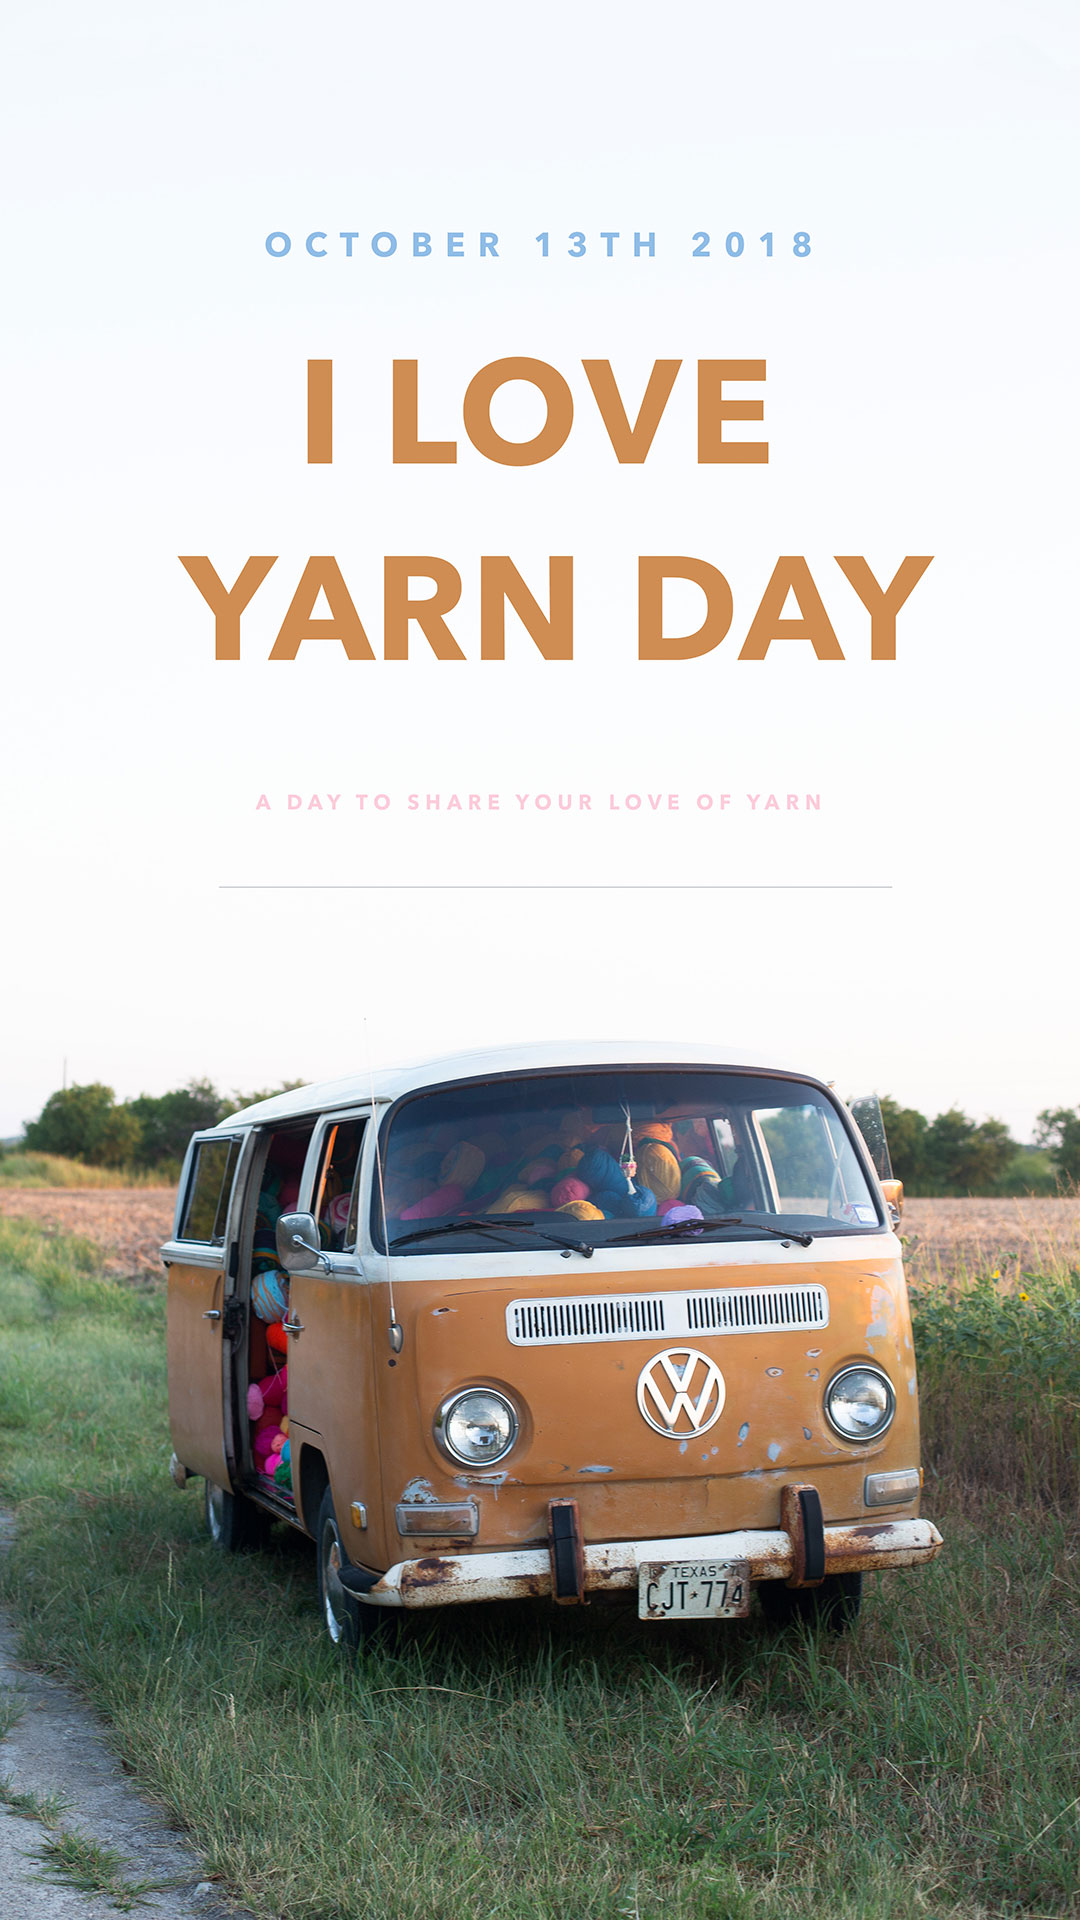 1080x1080 Instagram I Love Yarn Day banner